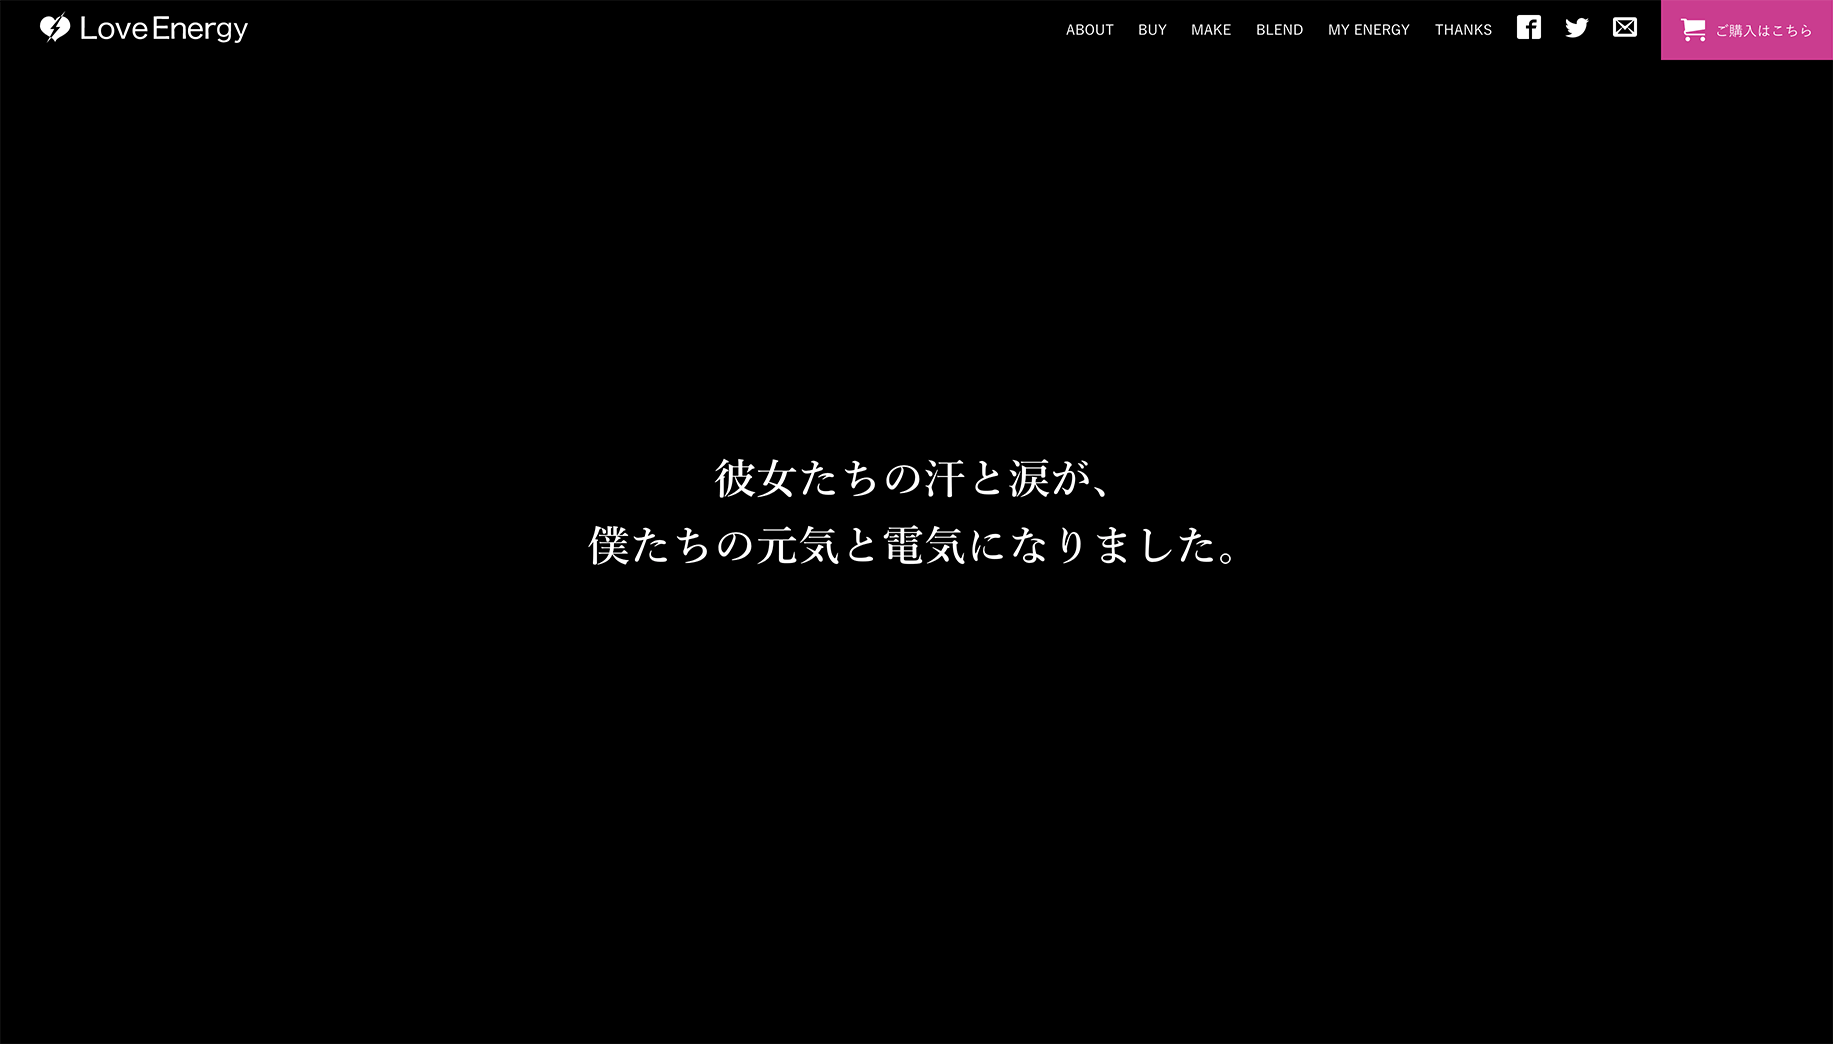 cap_le_pc1